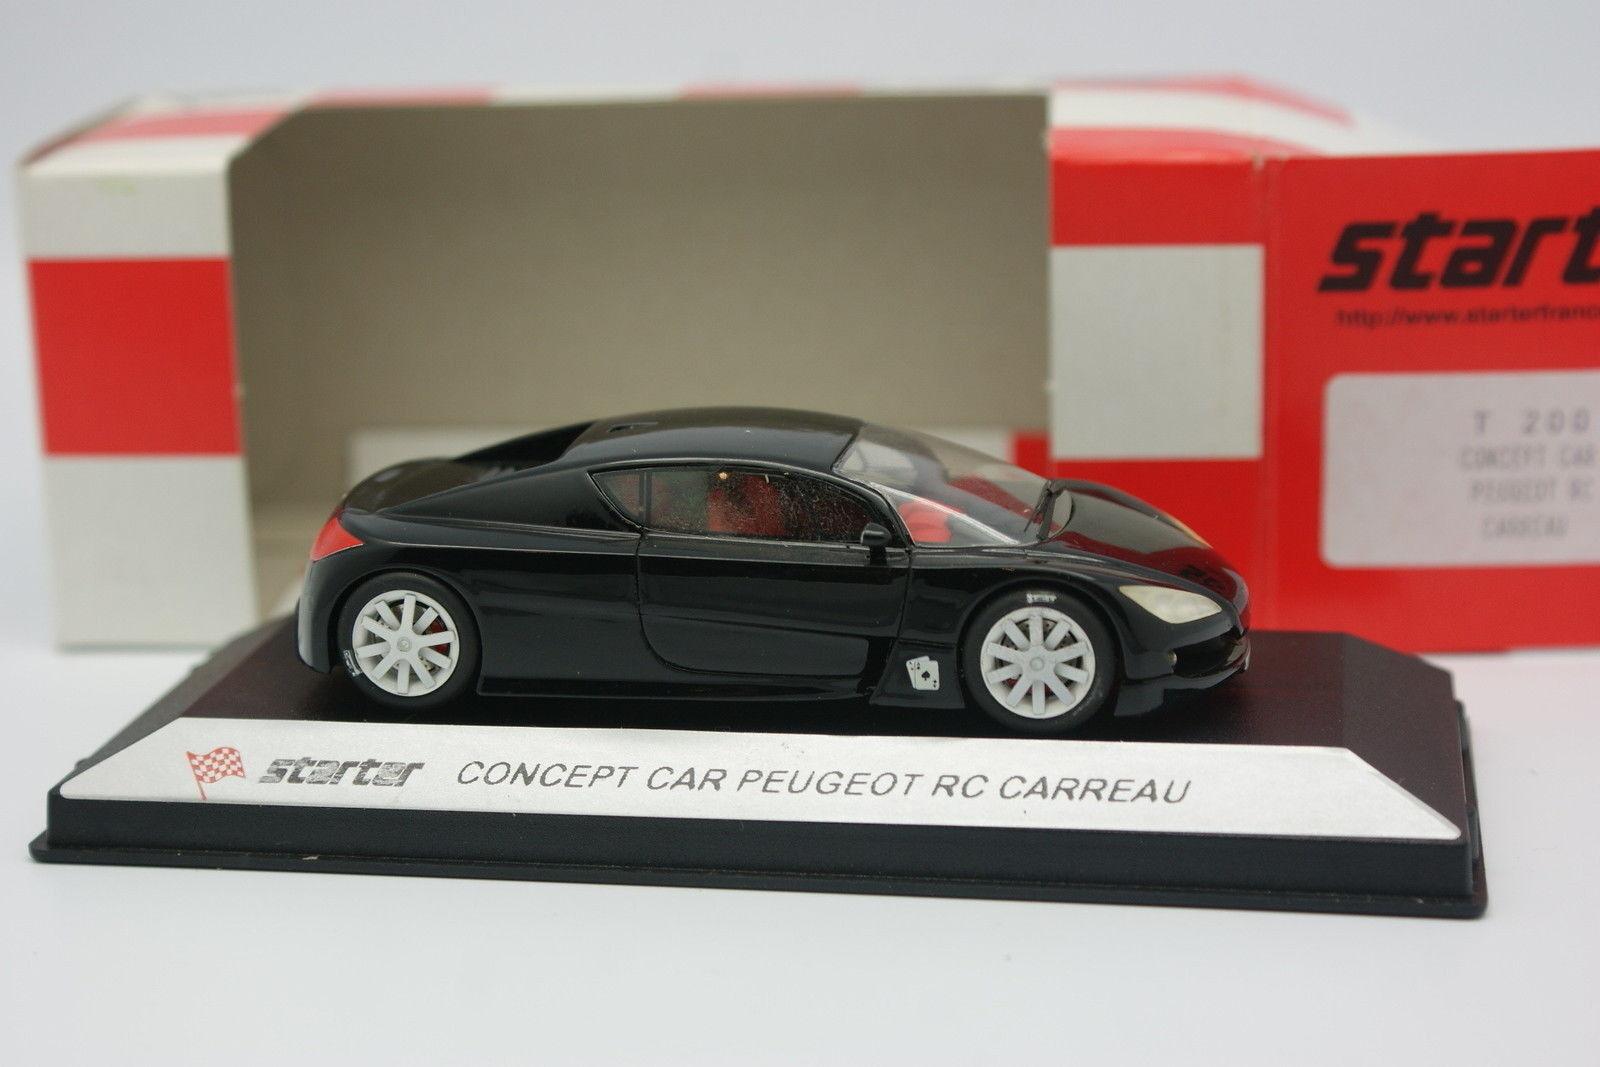 Starter 1 43 - Peugeot Concept Car RC Check